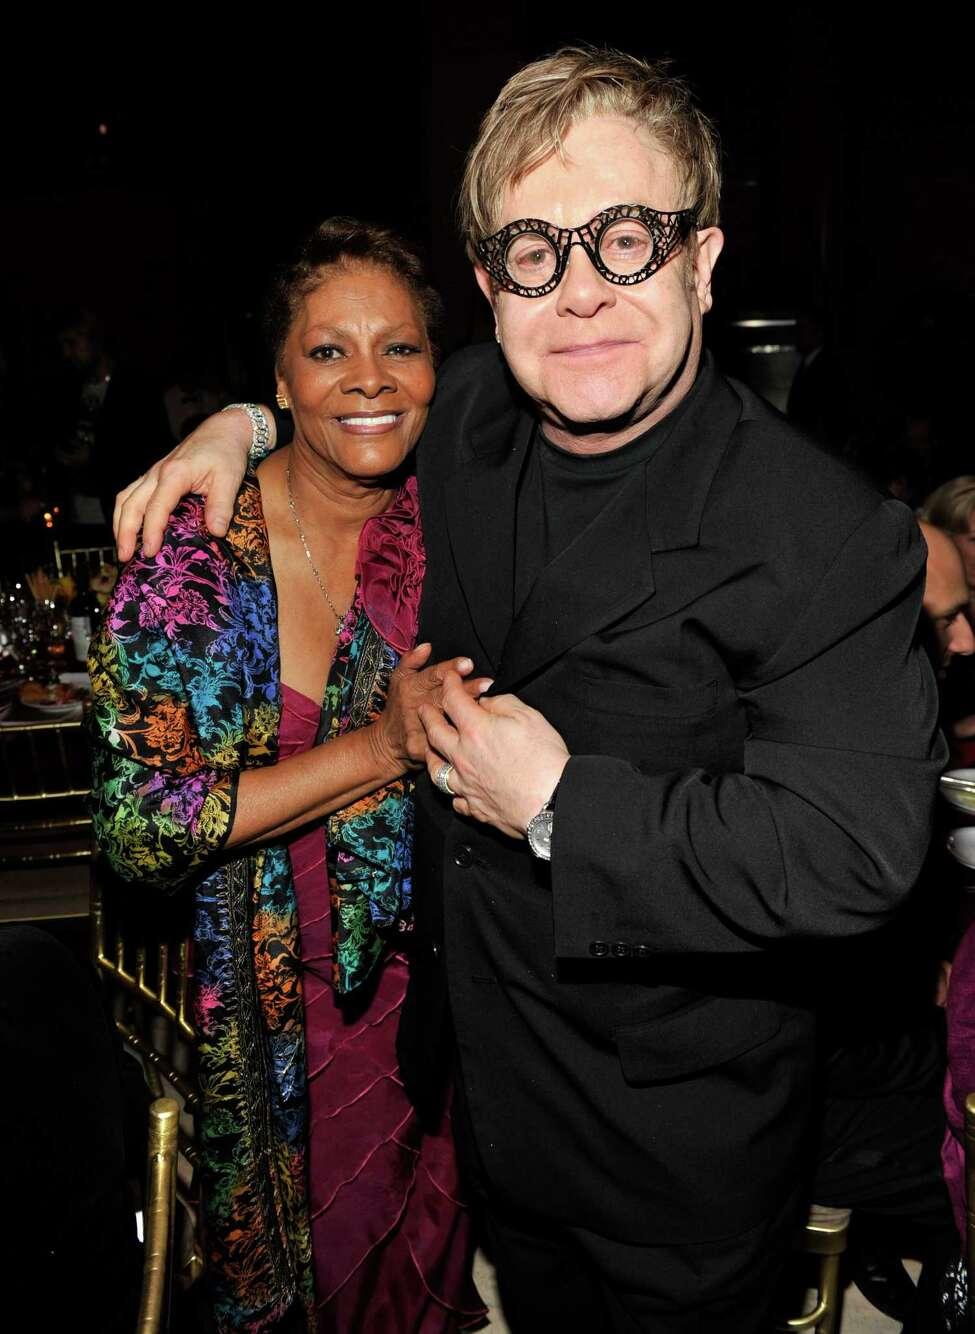 Best Elton Collaborators In the studio, Elton recorded No. 1 hits with John Lennon (